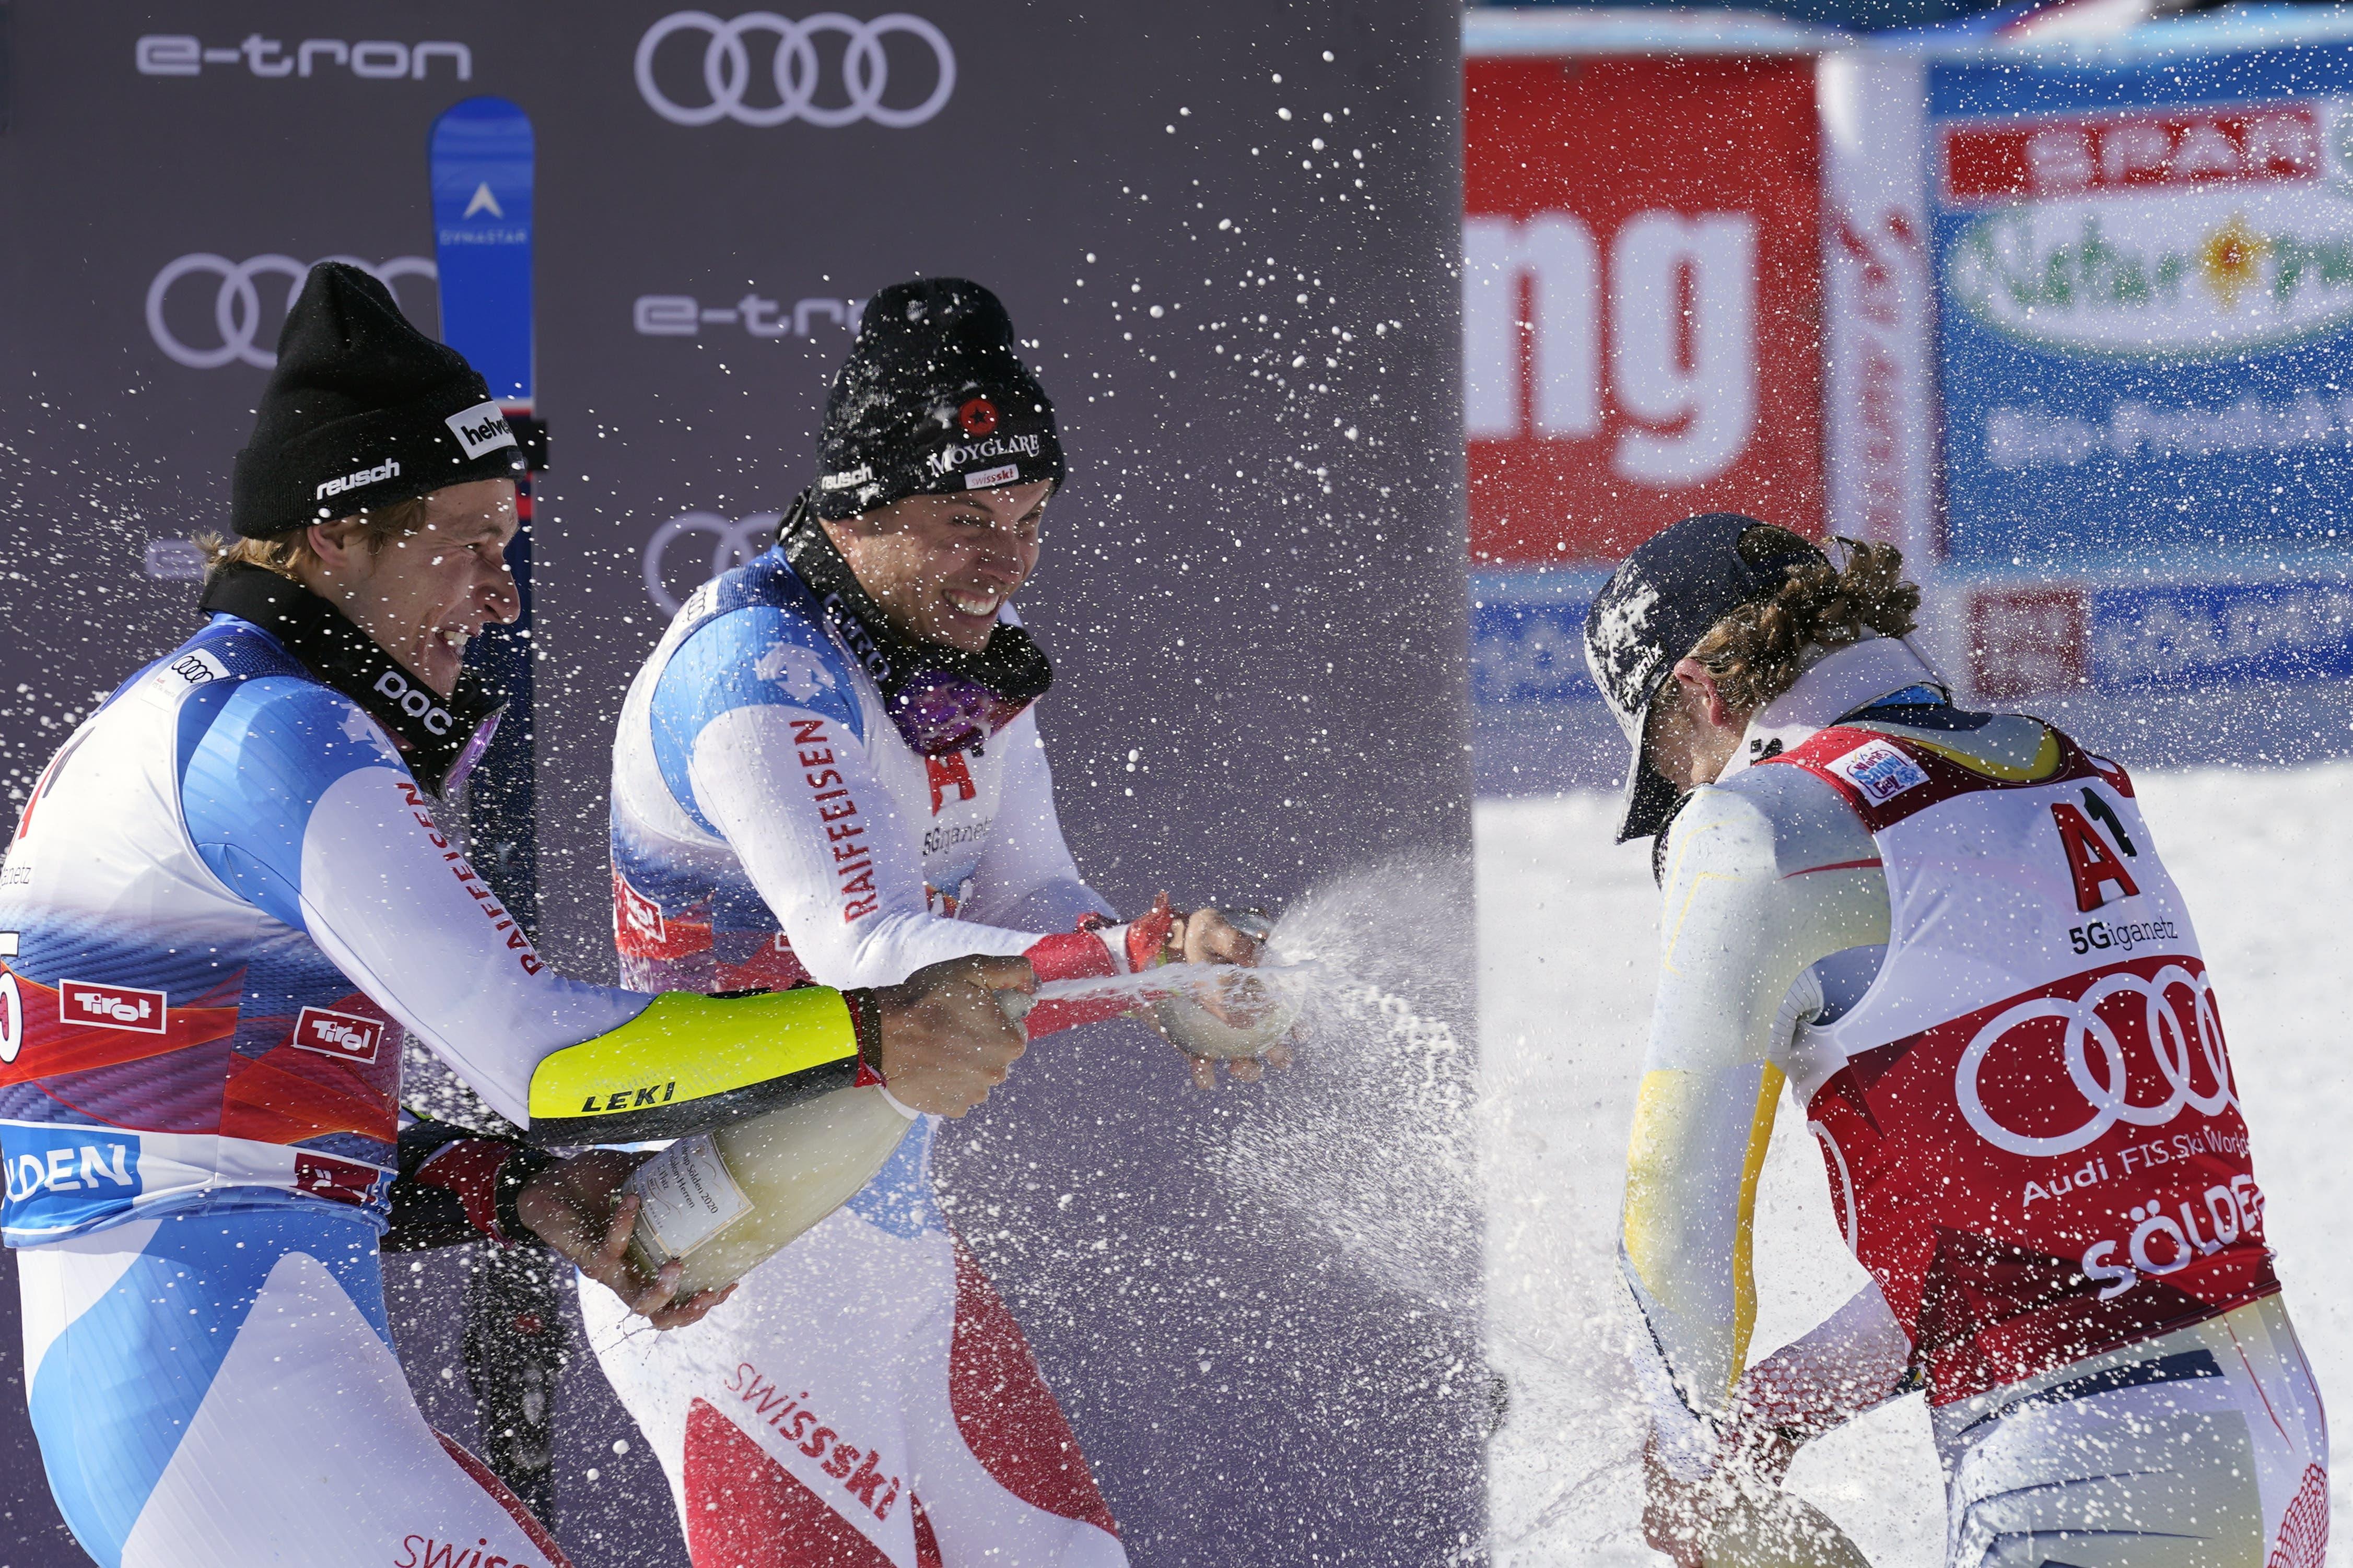 Lucas Braathen (Norwegen) gewinnt den Riesenslalom in Sölden.